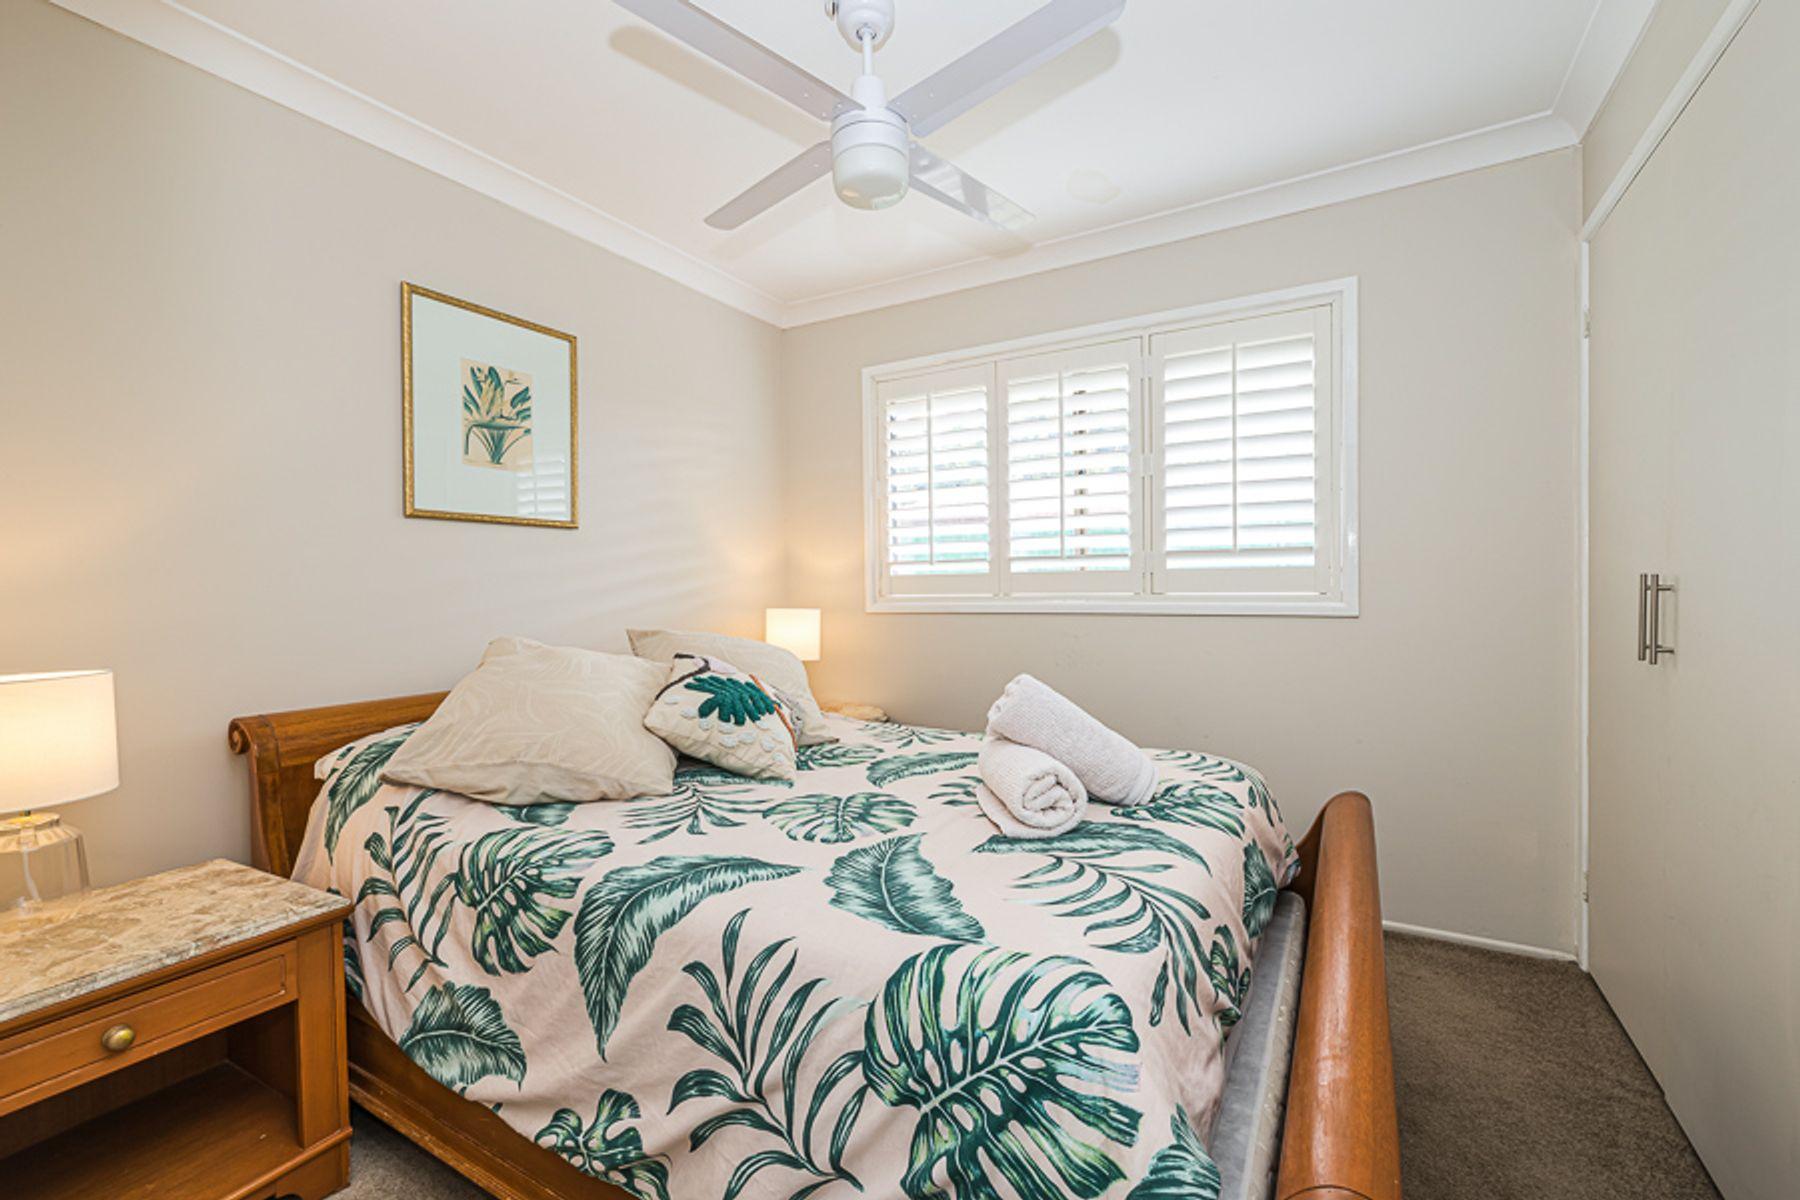 95 Eucalypt Street, Bellara, QLD 4507